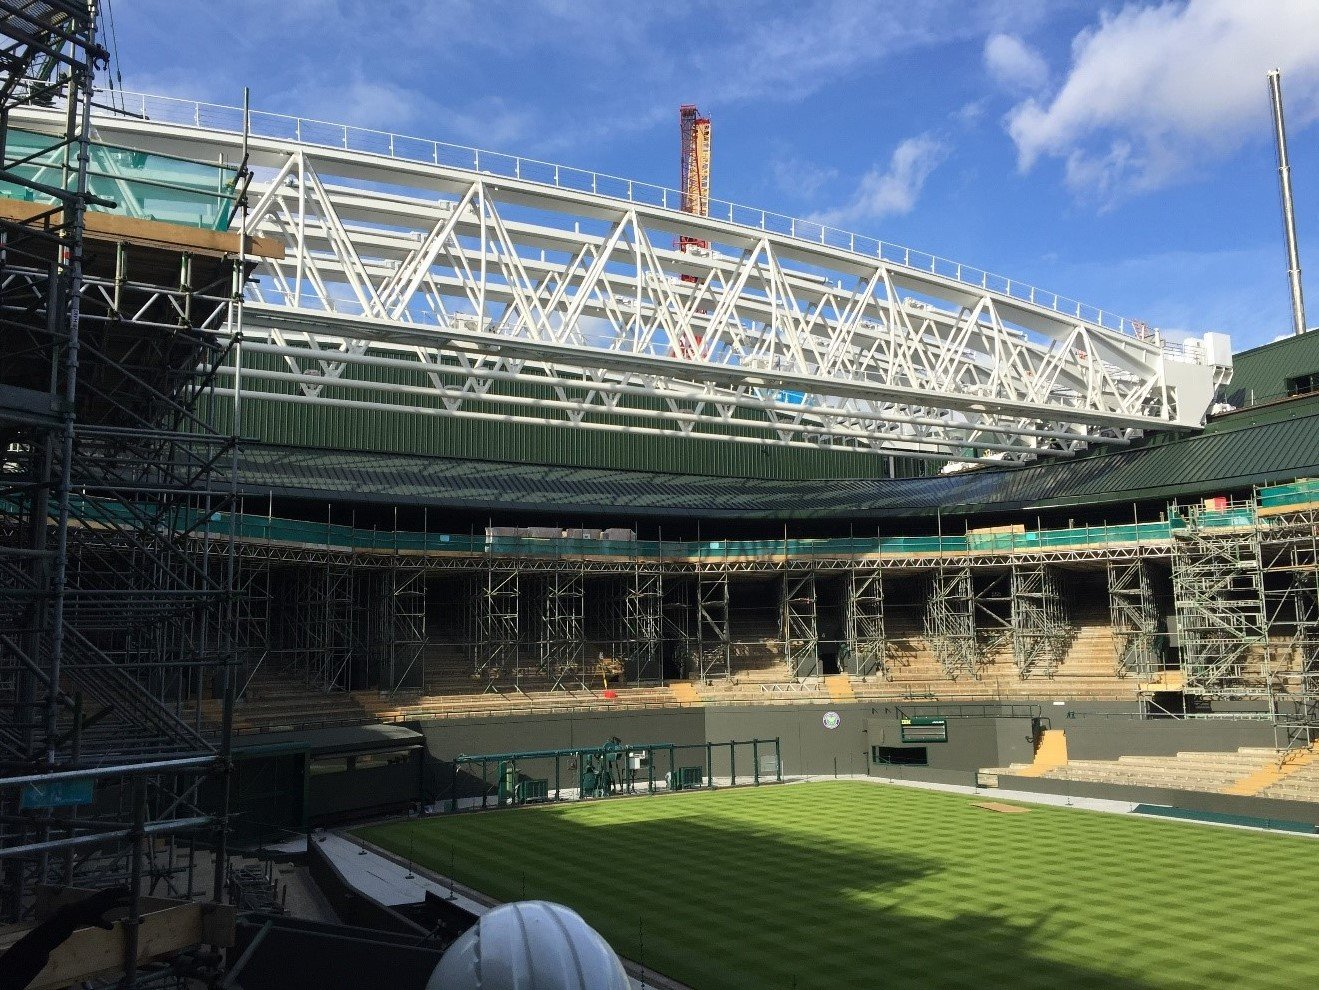 Wimbledon roof